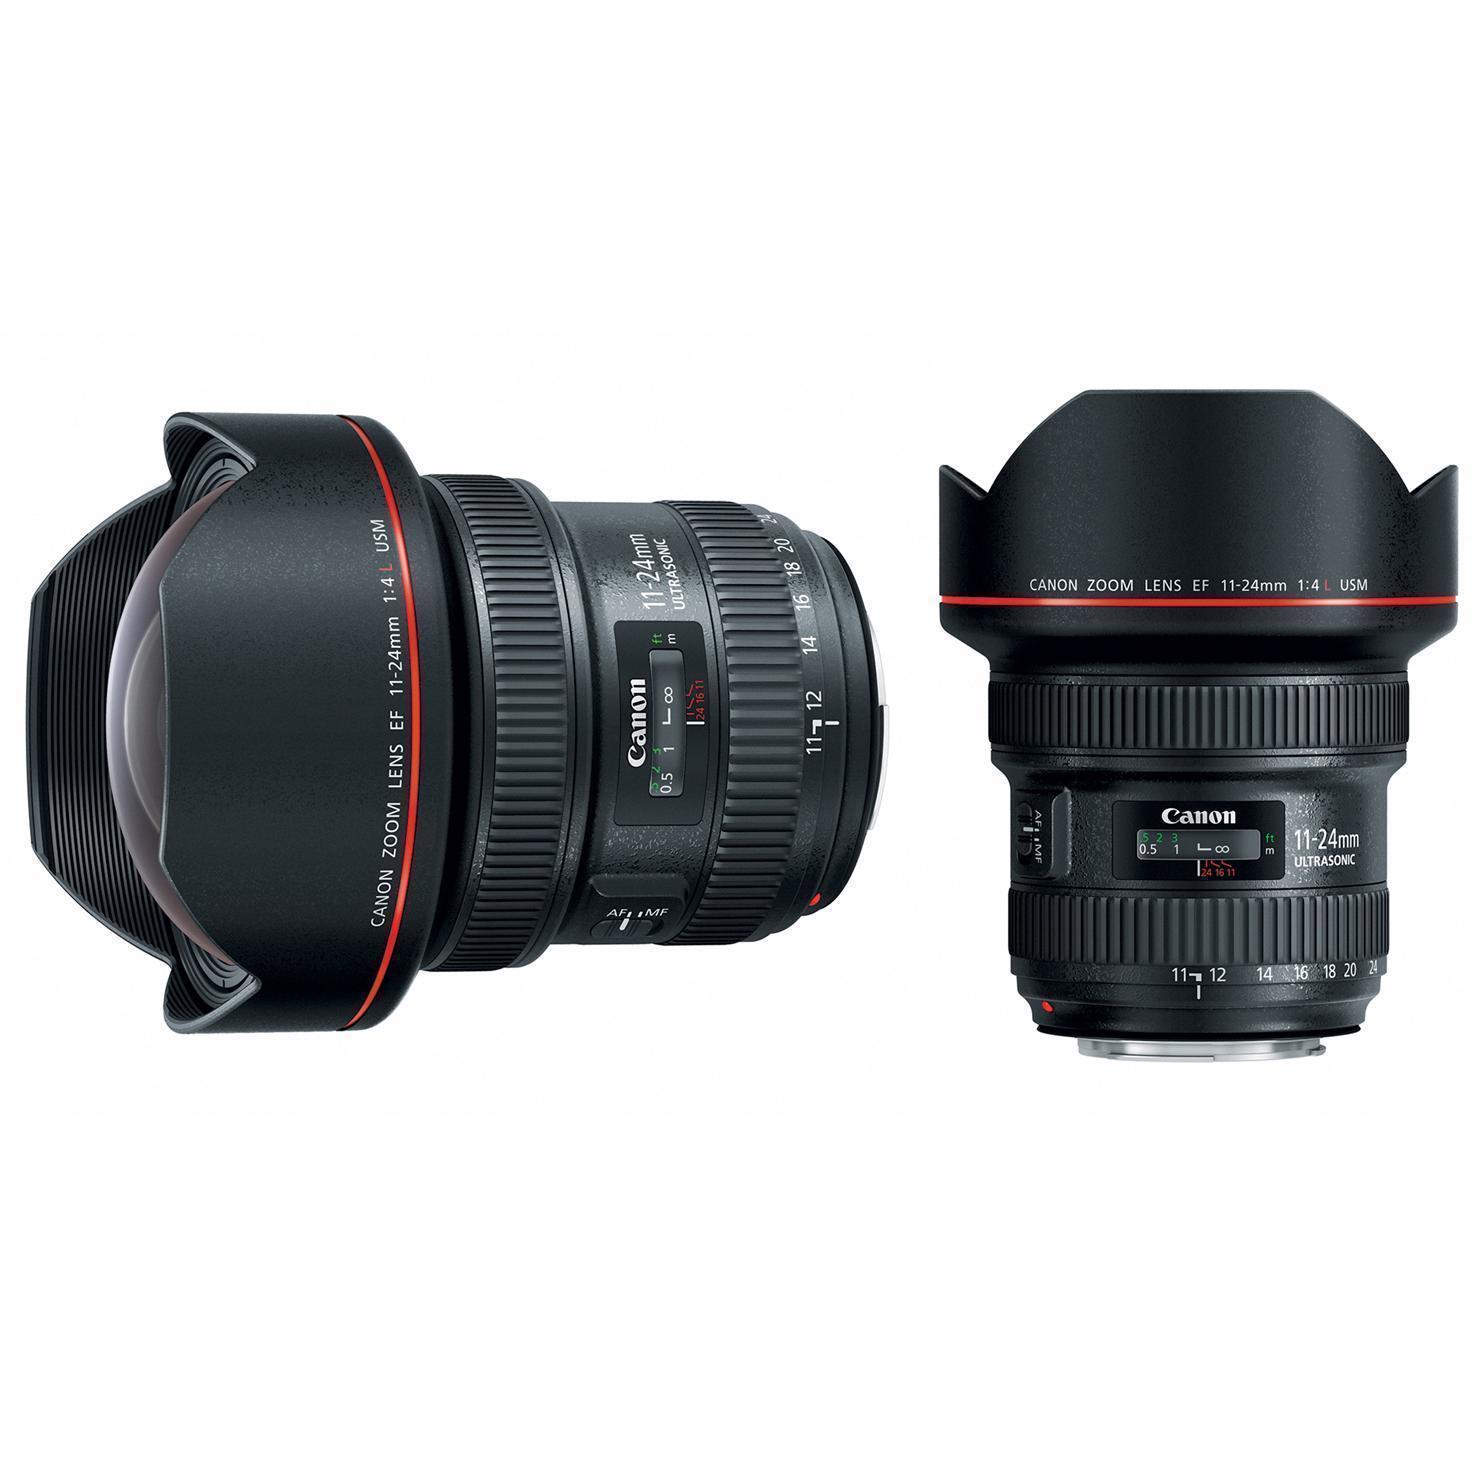 Objectif Canon EF 11-24mm f/4